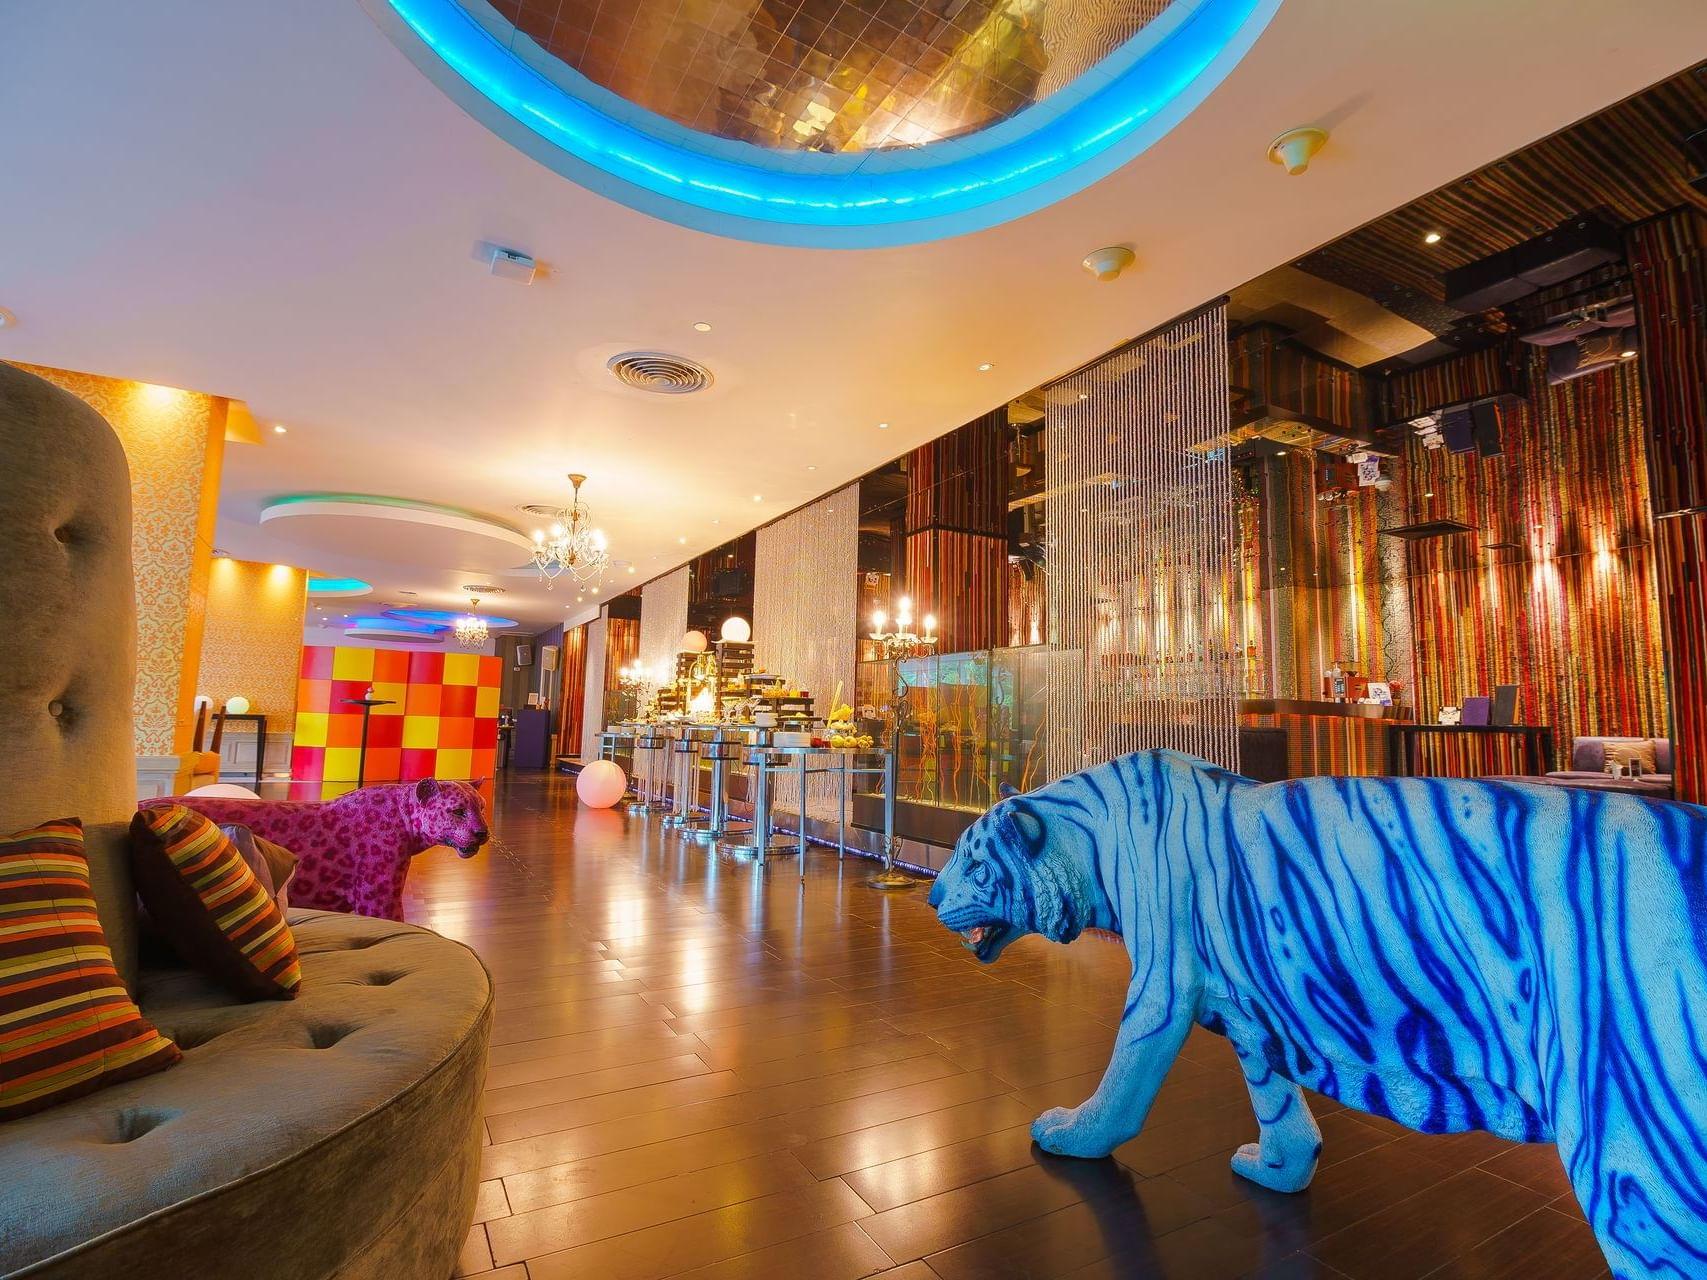 Tow tiger statue in flava venues meeting room at Dream Bangkok